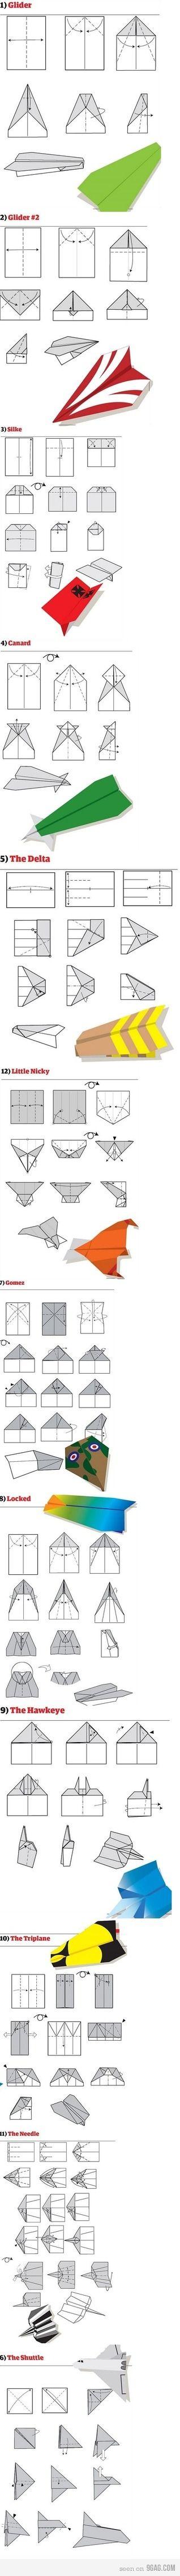 where was this when i was a kid?? Paper airplanes! Wheeeeeooooow!